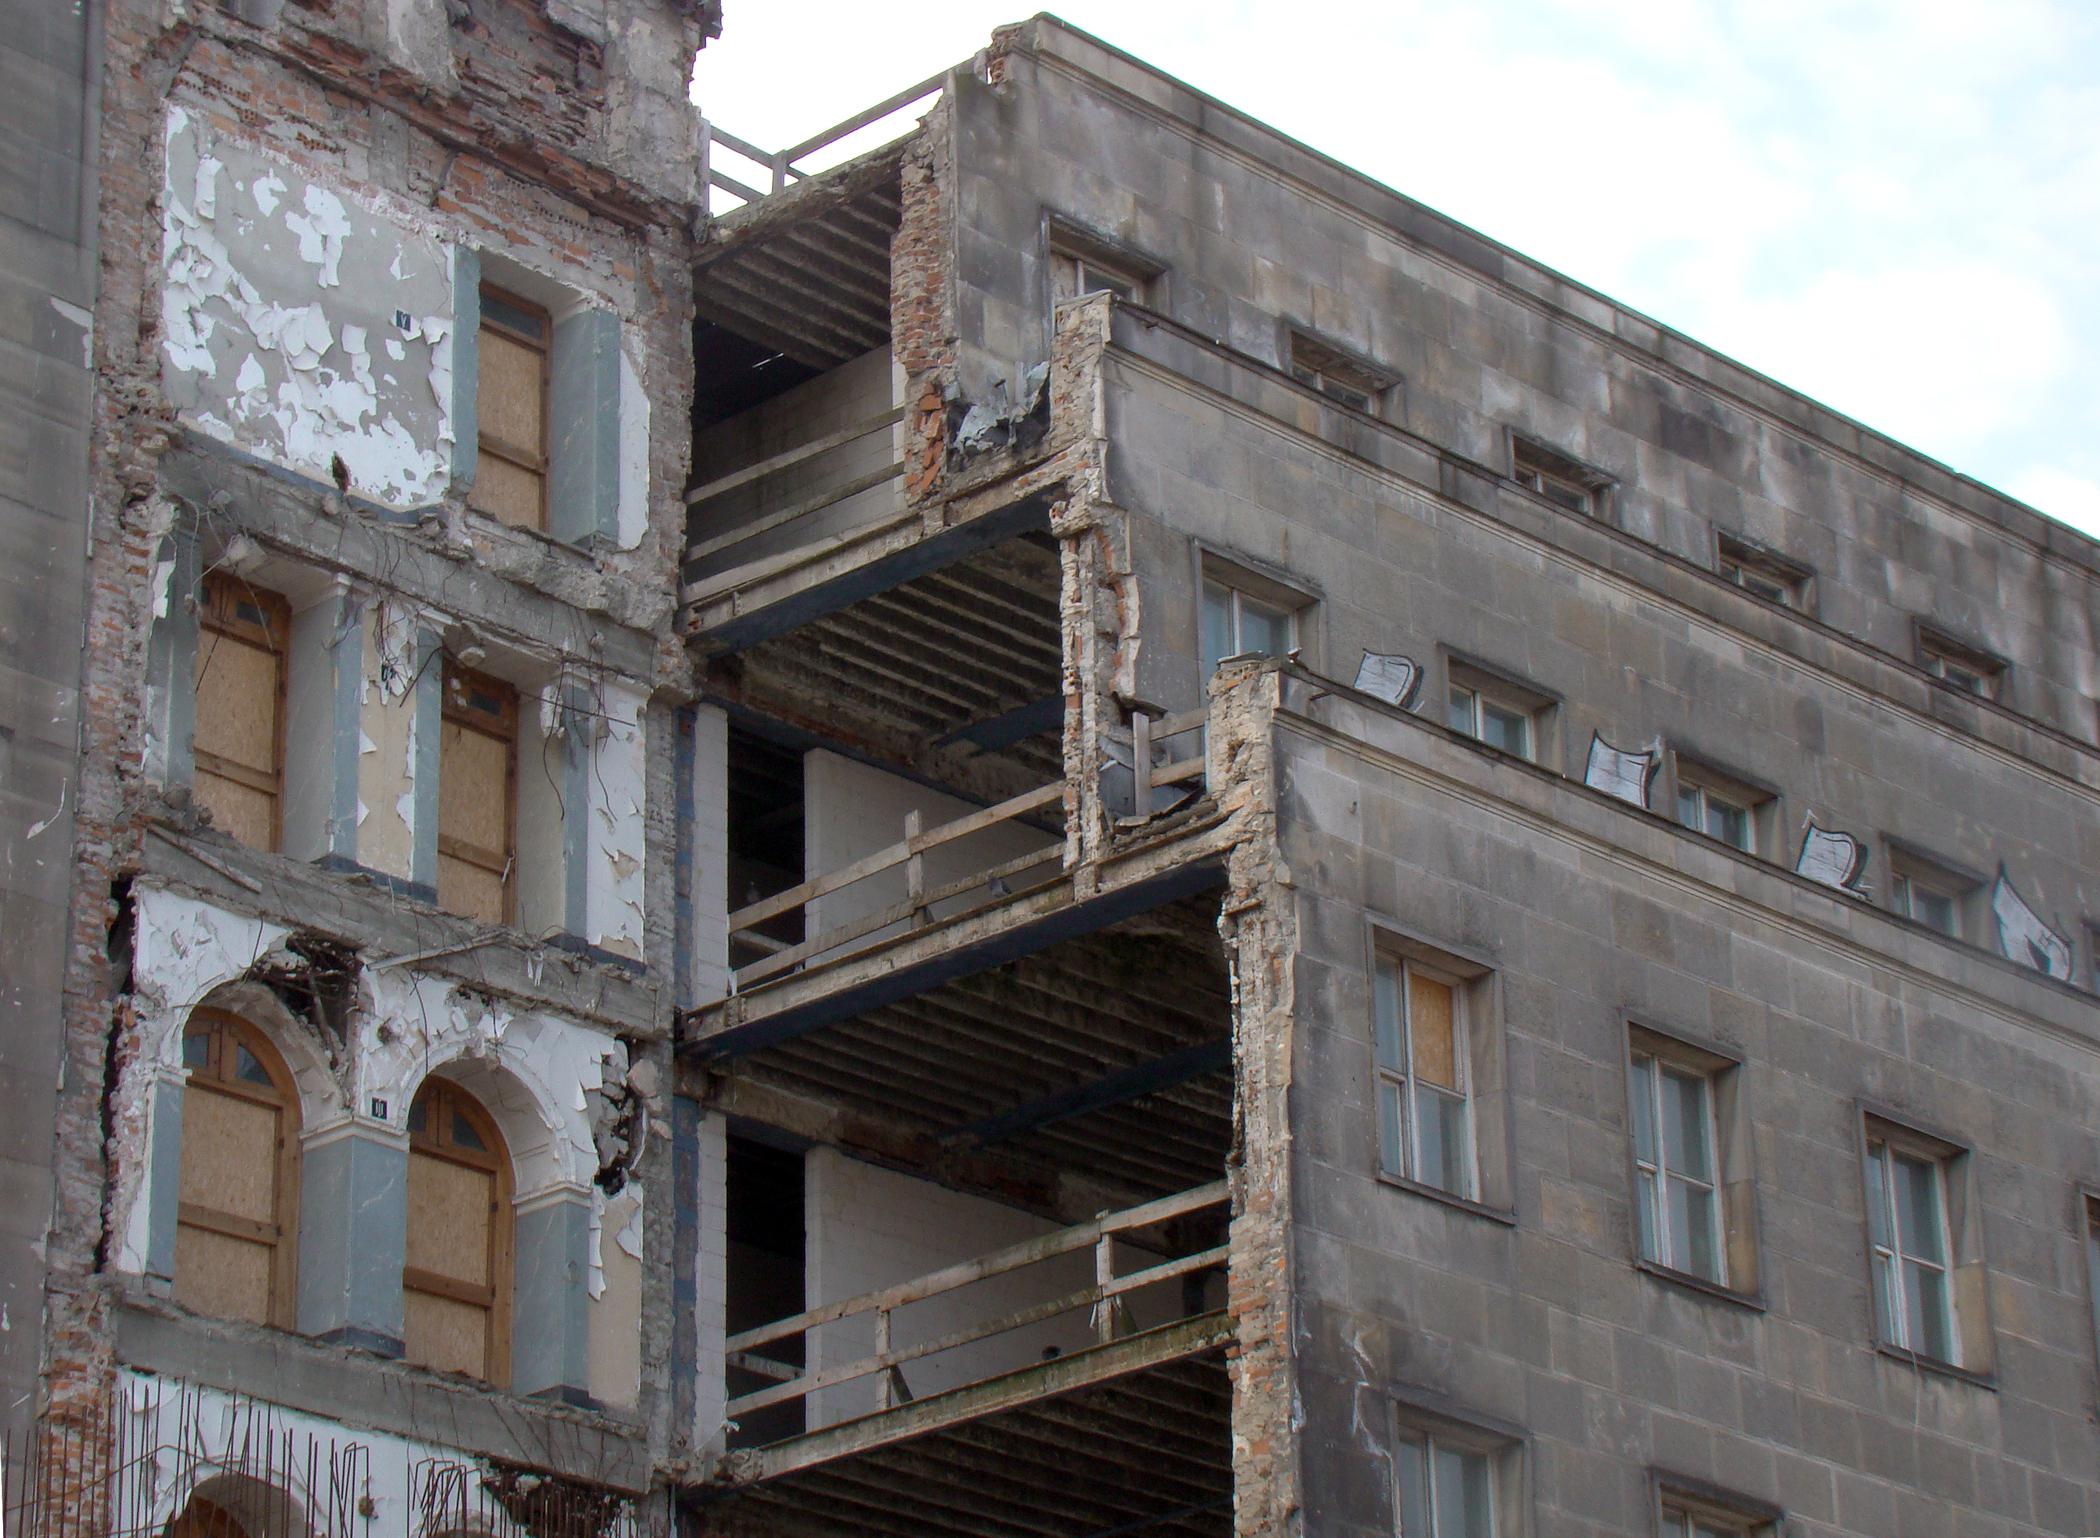 Street City Building Downtown Day Poland Warsaw Wreck Oldbuilding Disrepair